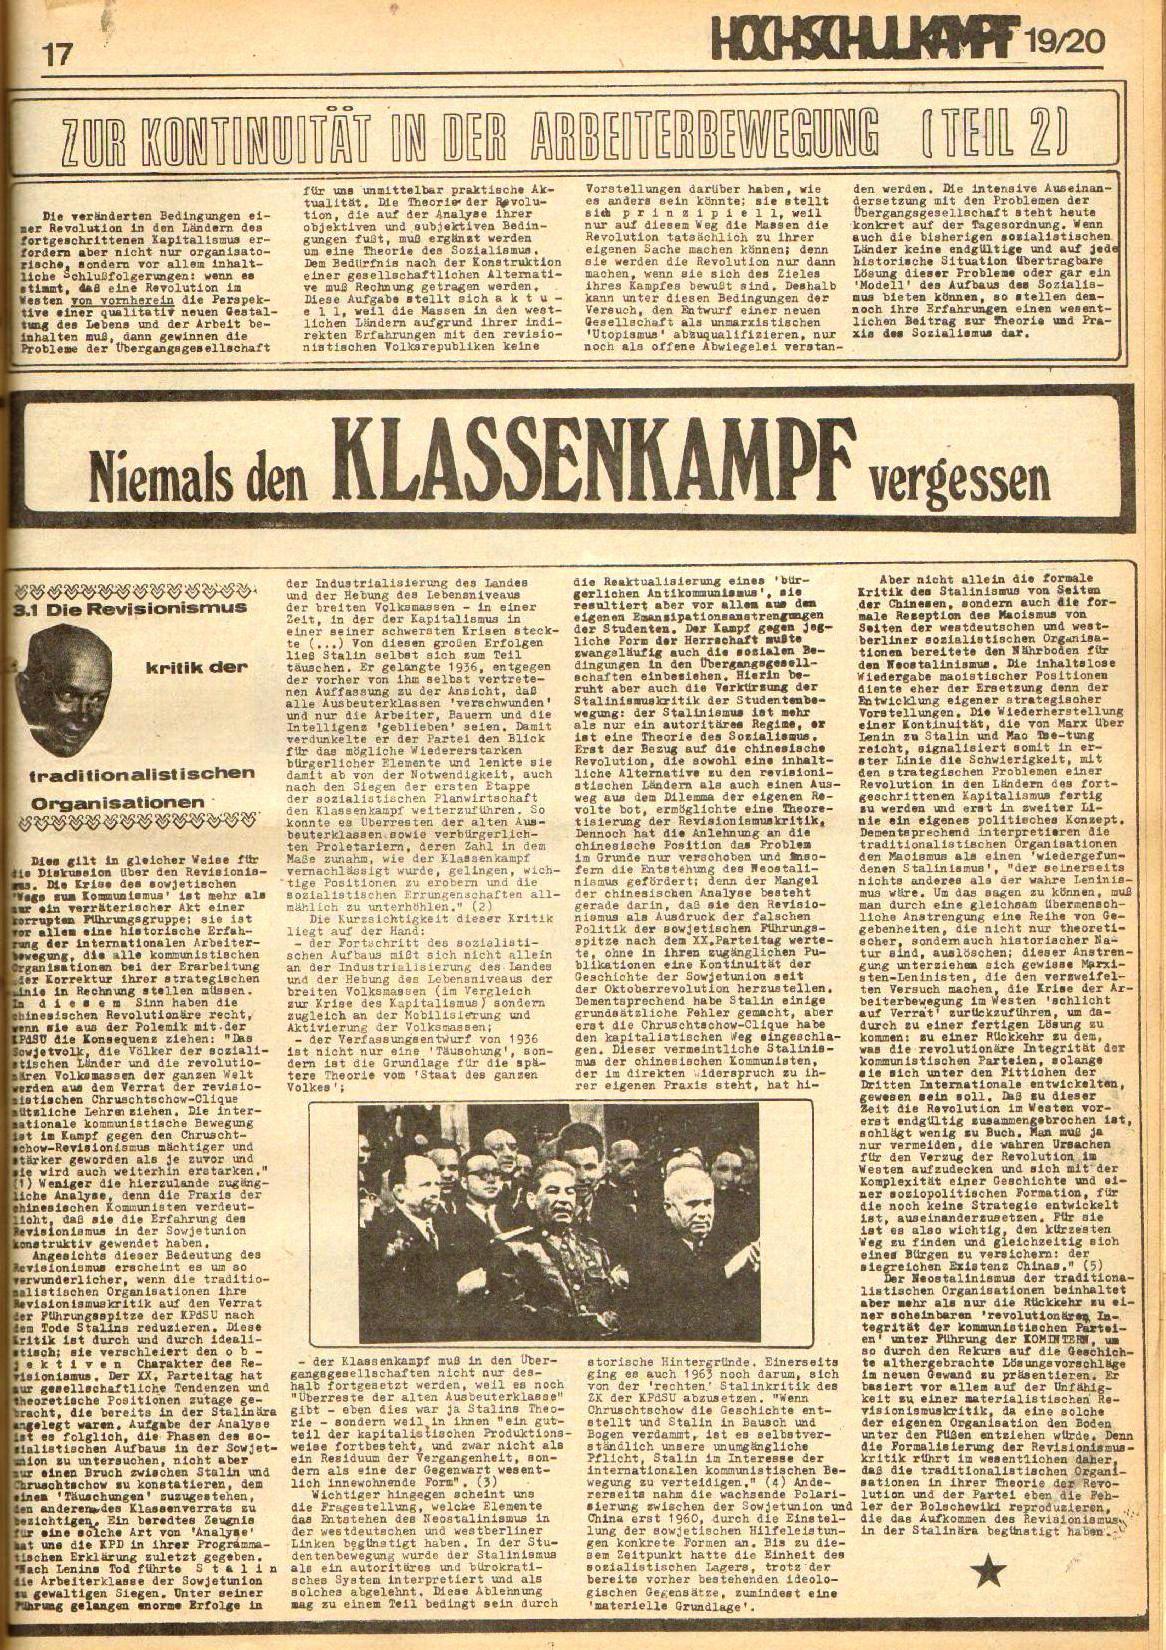 Berlin_Hochschulkampf_1971_19_17